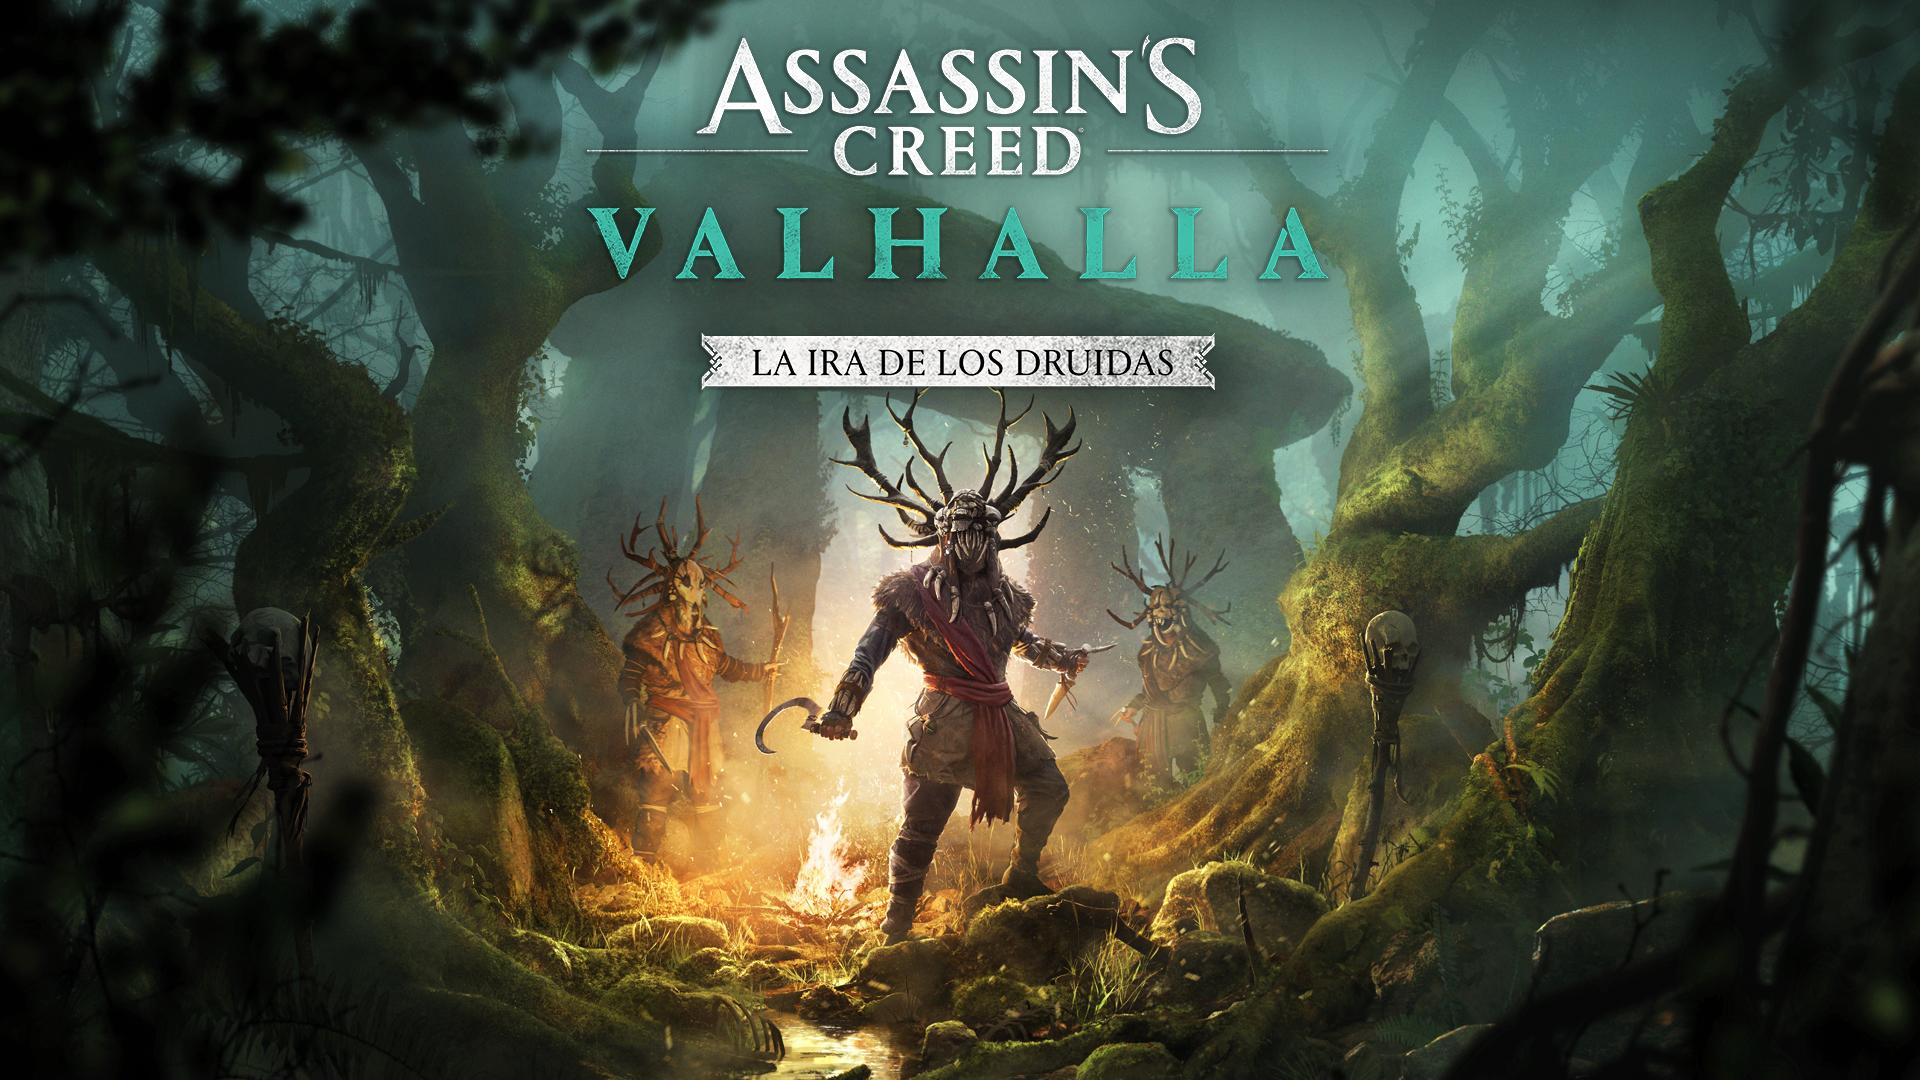 ASSASSIN'S CREED VALHALLA:  NUEVA EXPANSIÓN